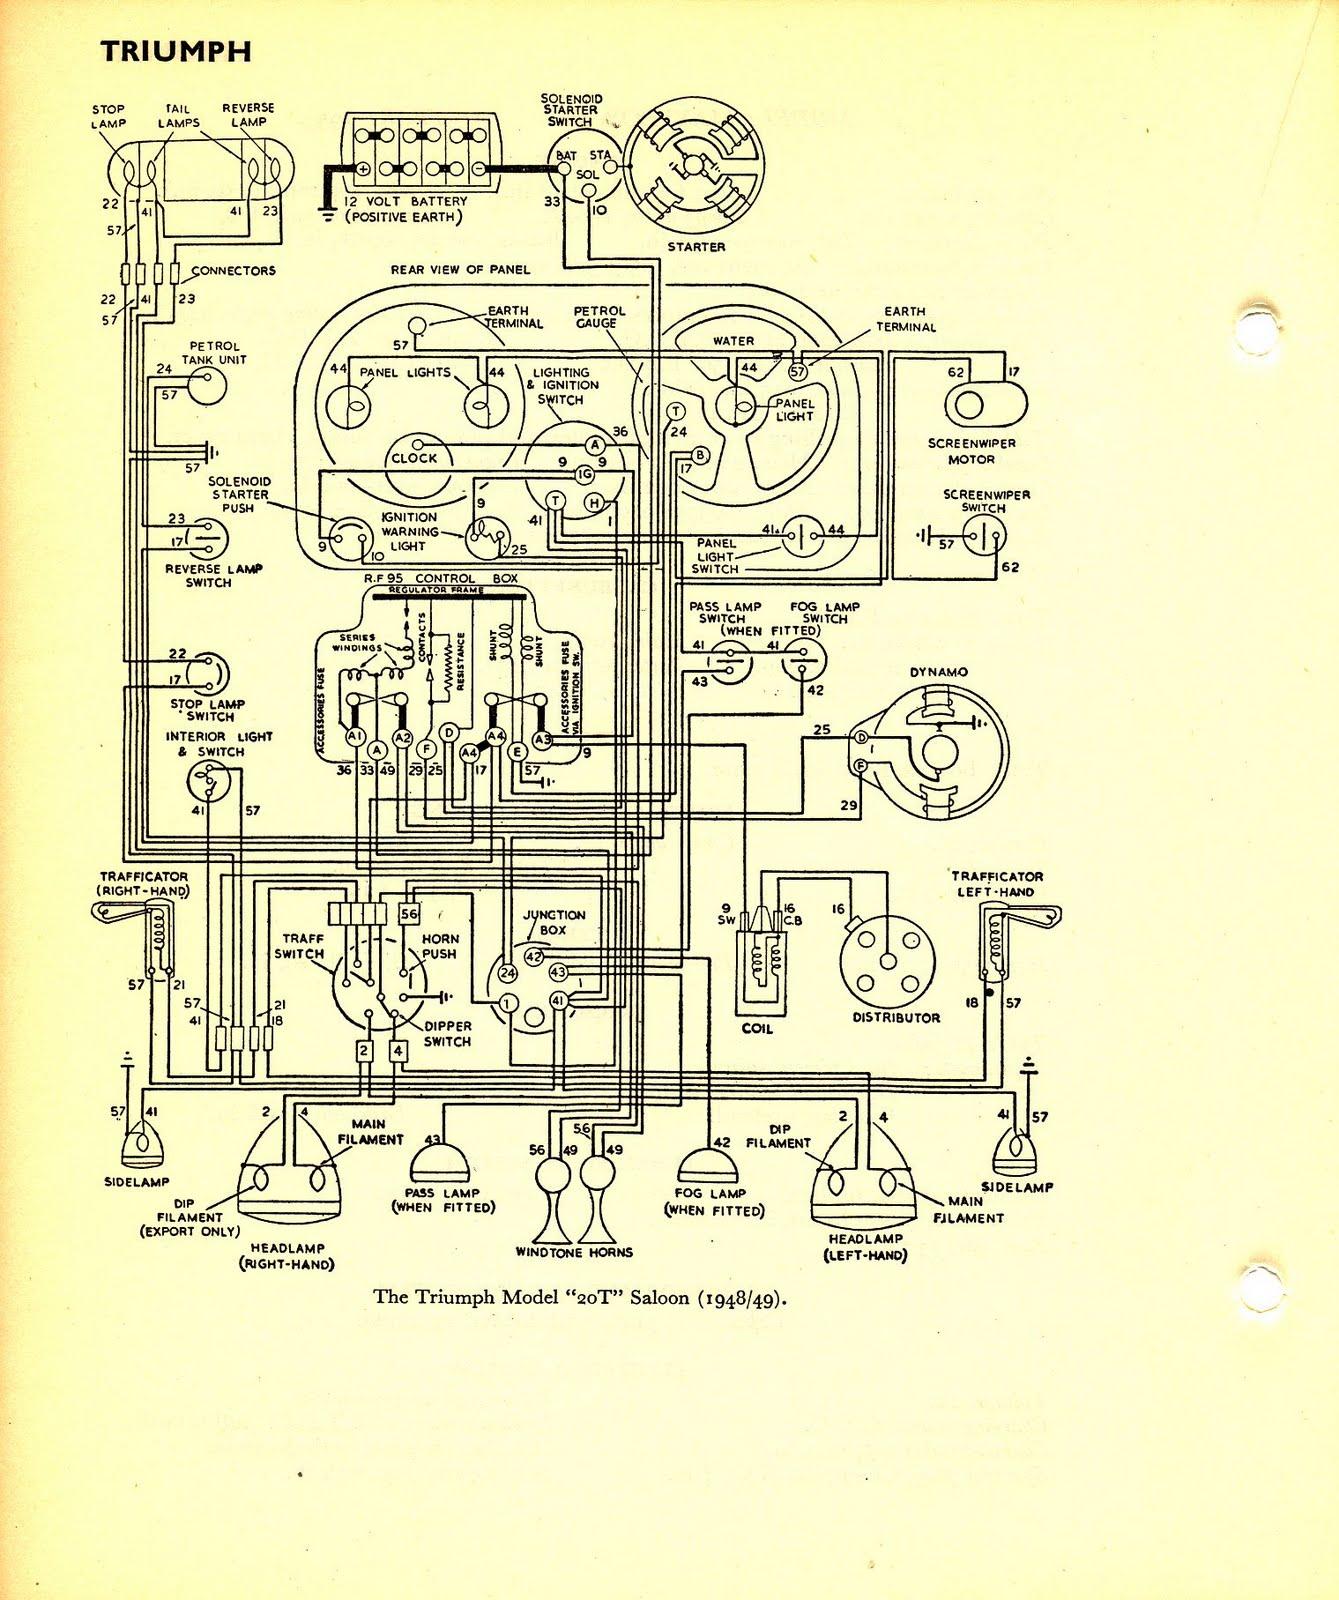 12 volt wiring diagram triumph wiring diagram